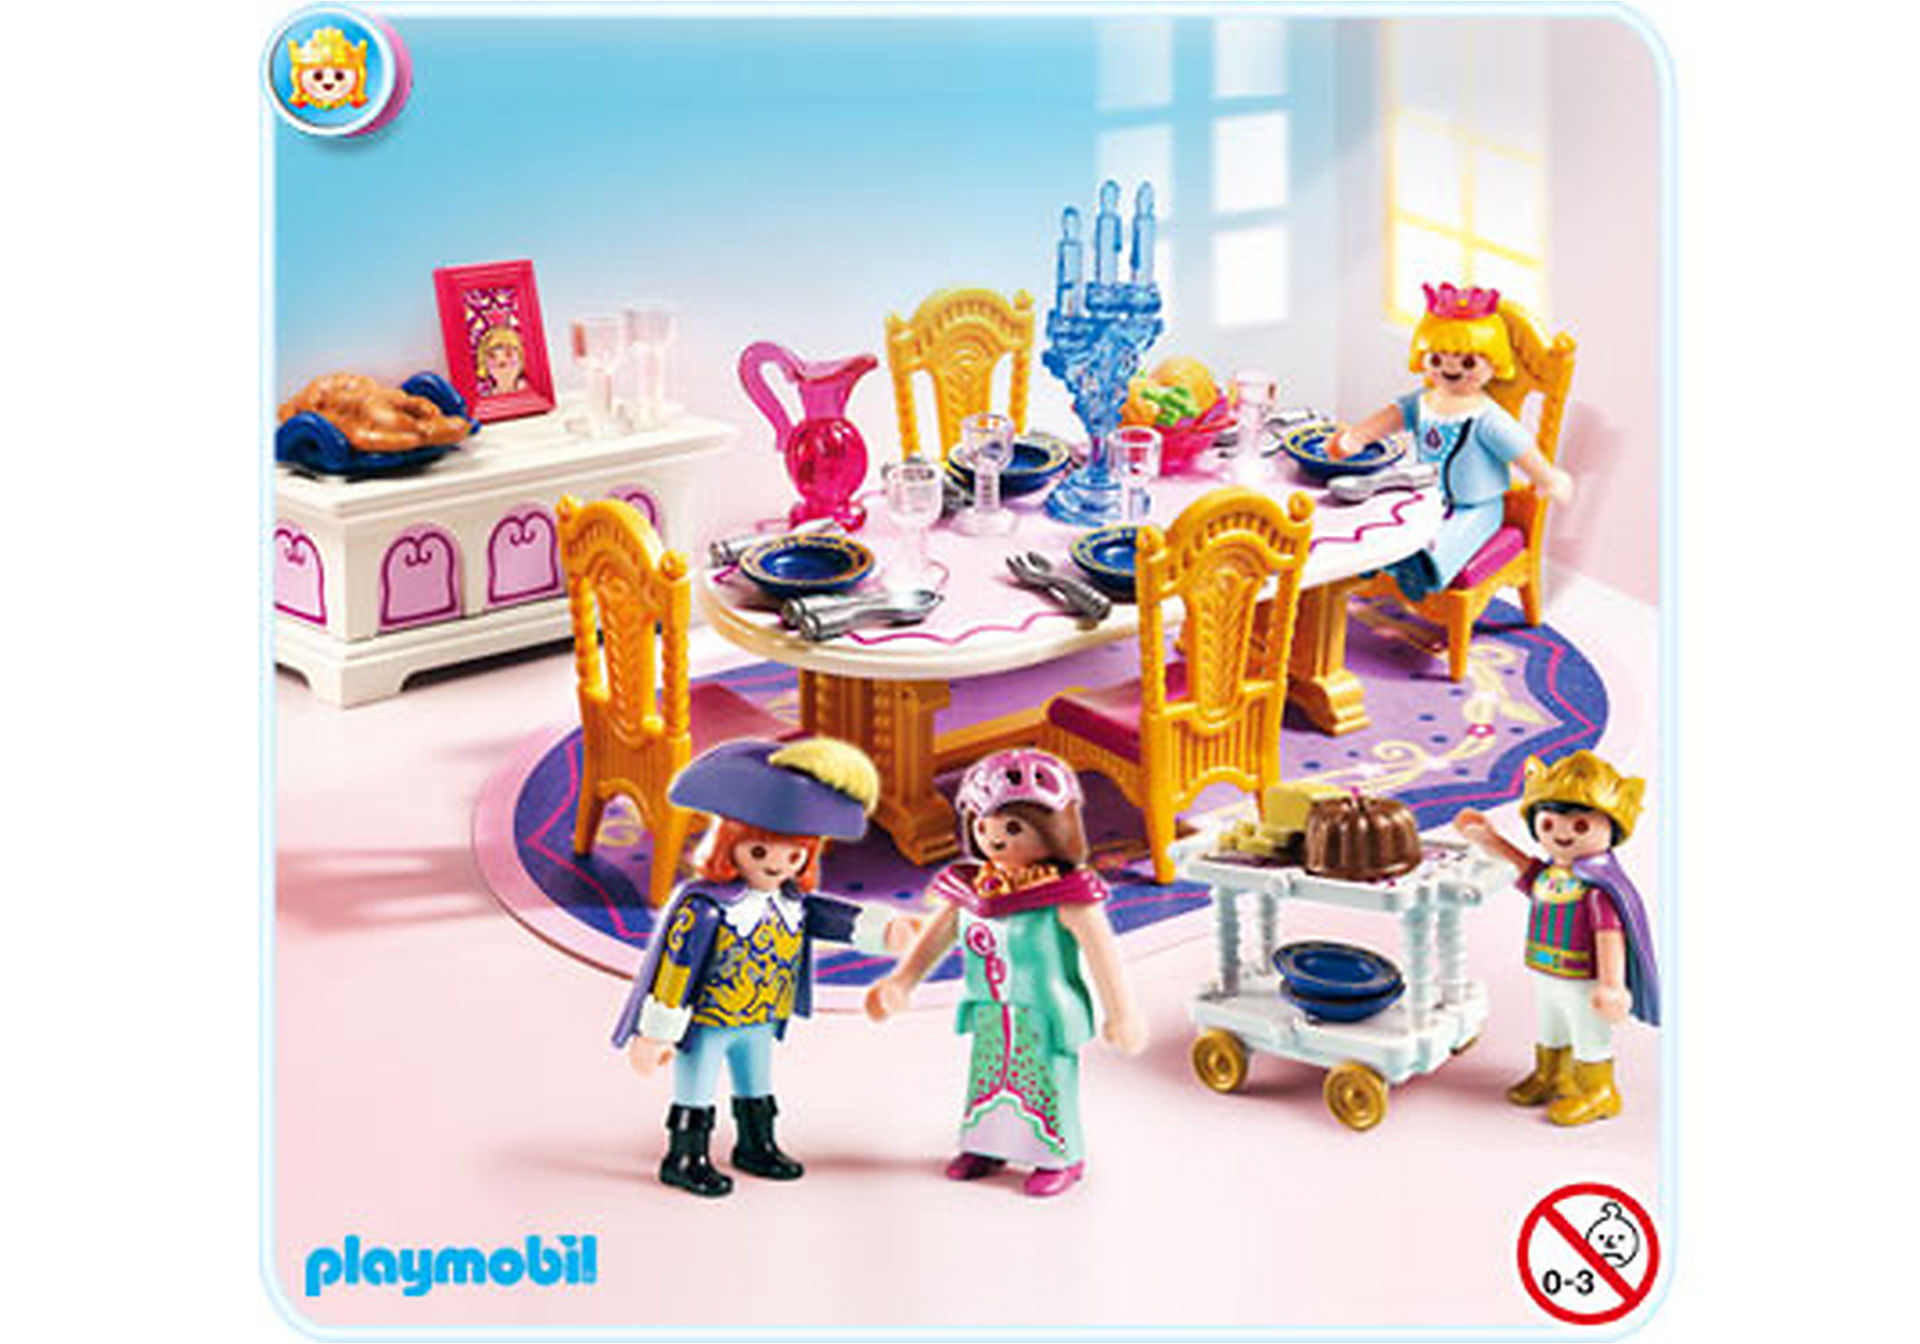 http://media.playmobil.com/i/playmobil/5145-A_product_detail/Königliche Festtafel